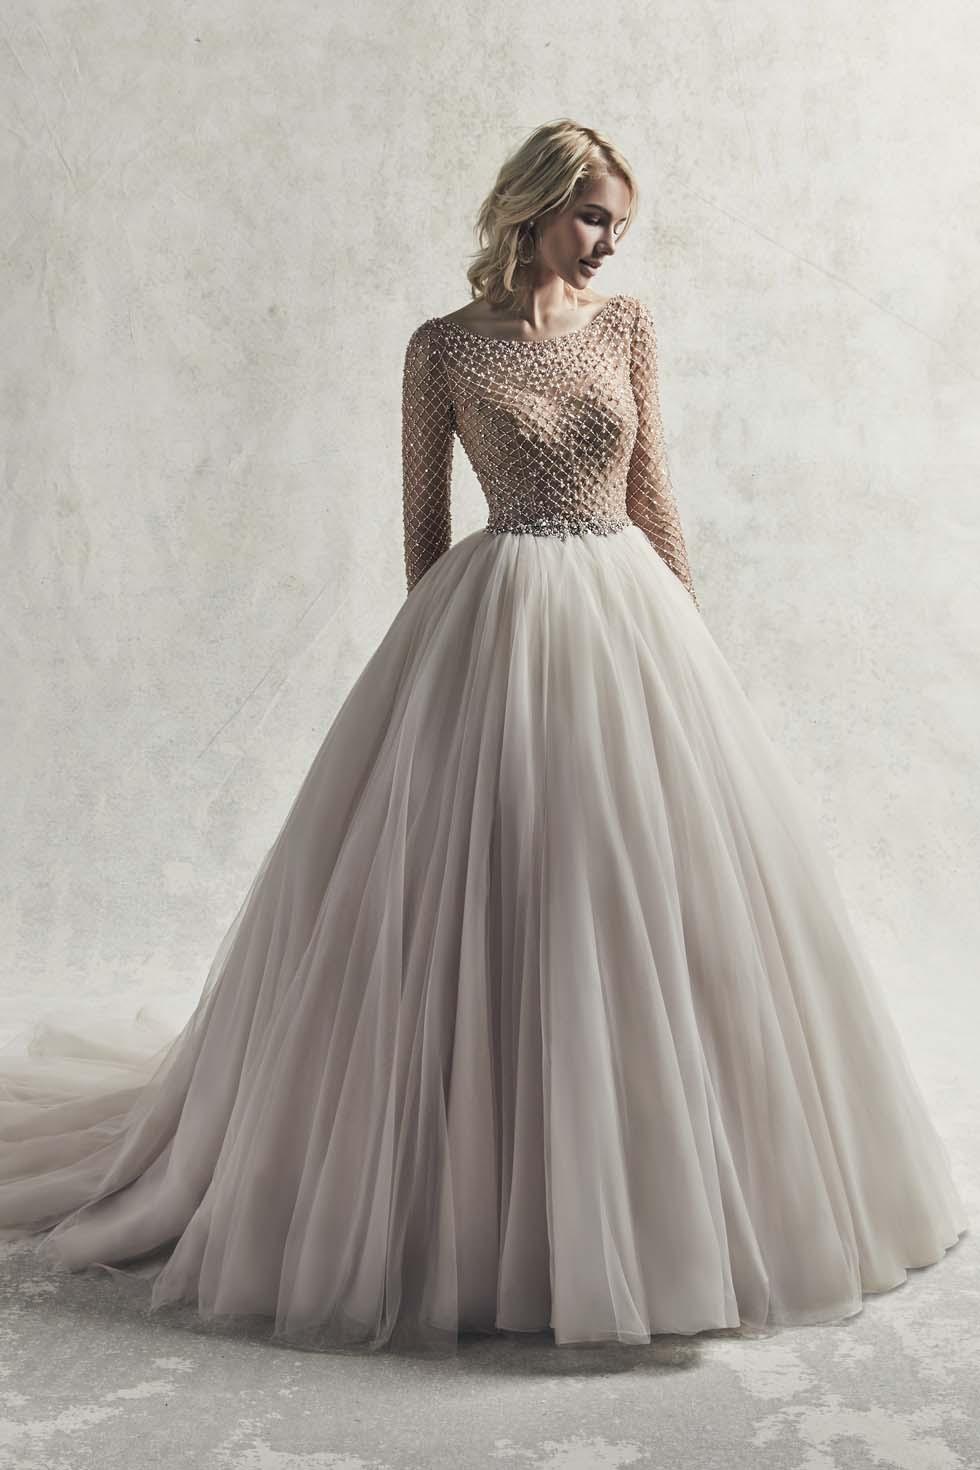 Brautkleid-Farbe Grauweiß Sottero and Midgley